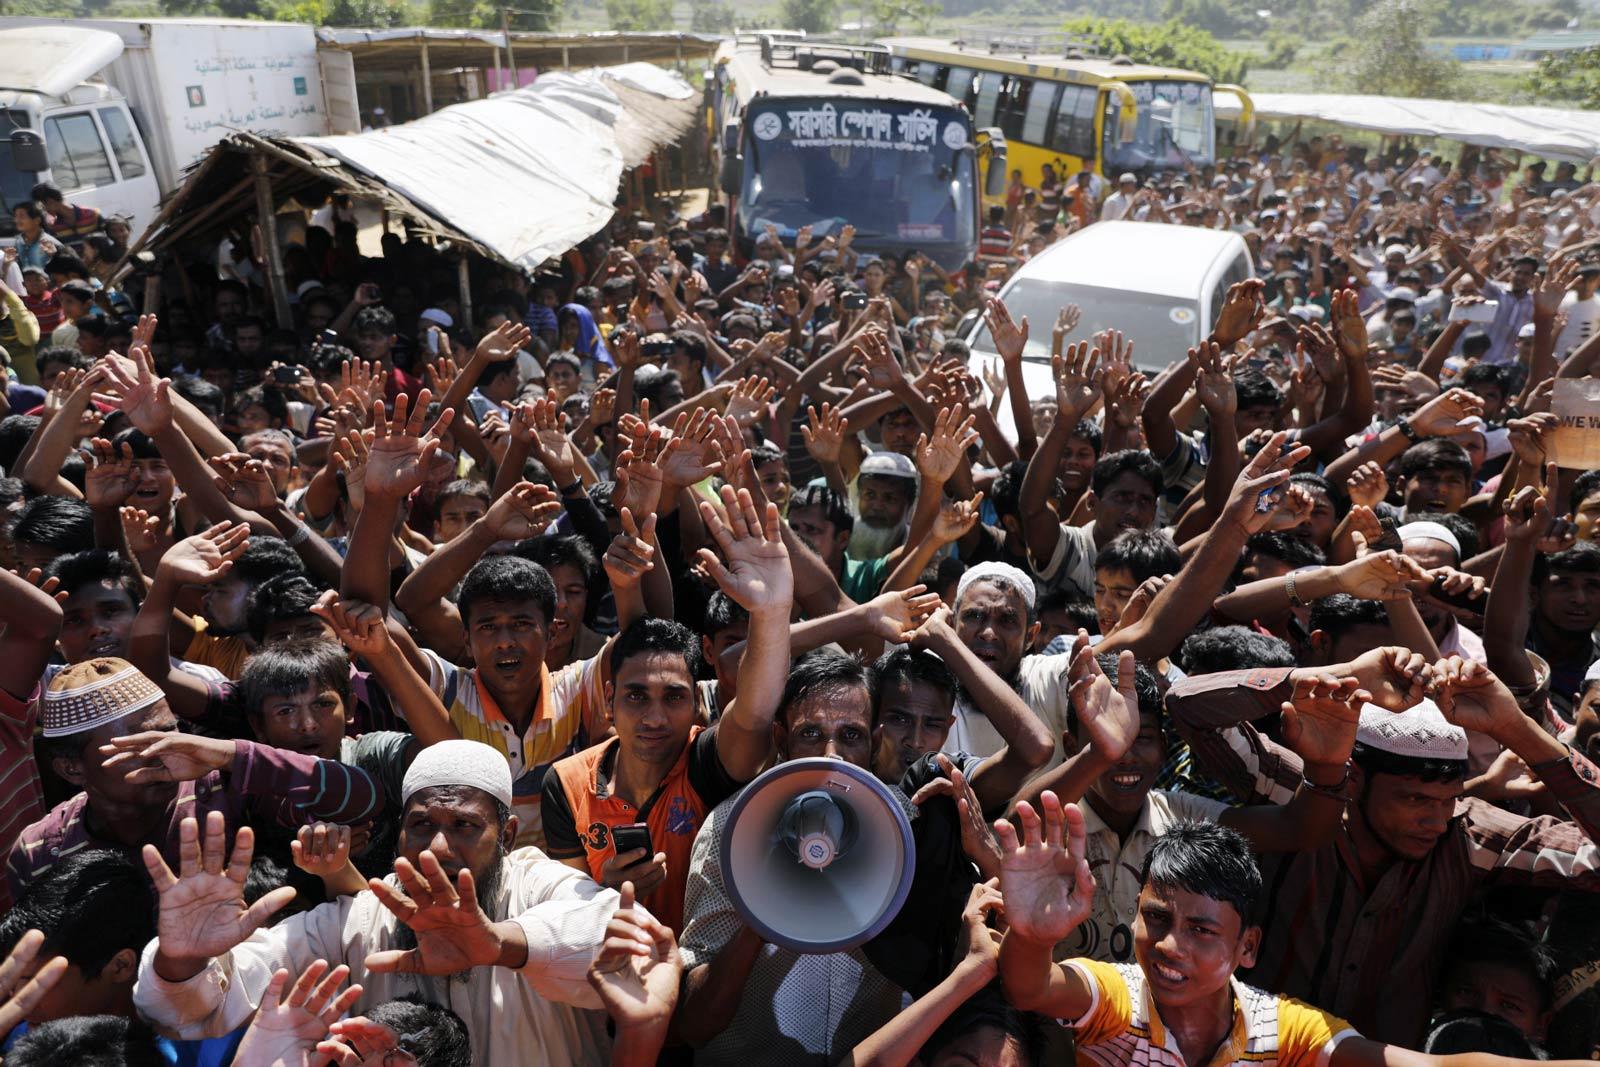 Rohingya refugees shout slogans during a protest against a disputed repatriation programme at the Unchiprang refugee camp near Teknaf, Bangladesh, 15 November 2018. Photo: EPA-EFE/K M Asad